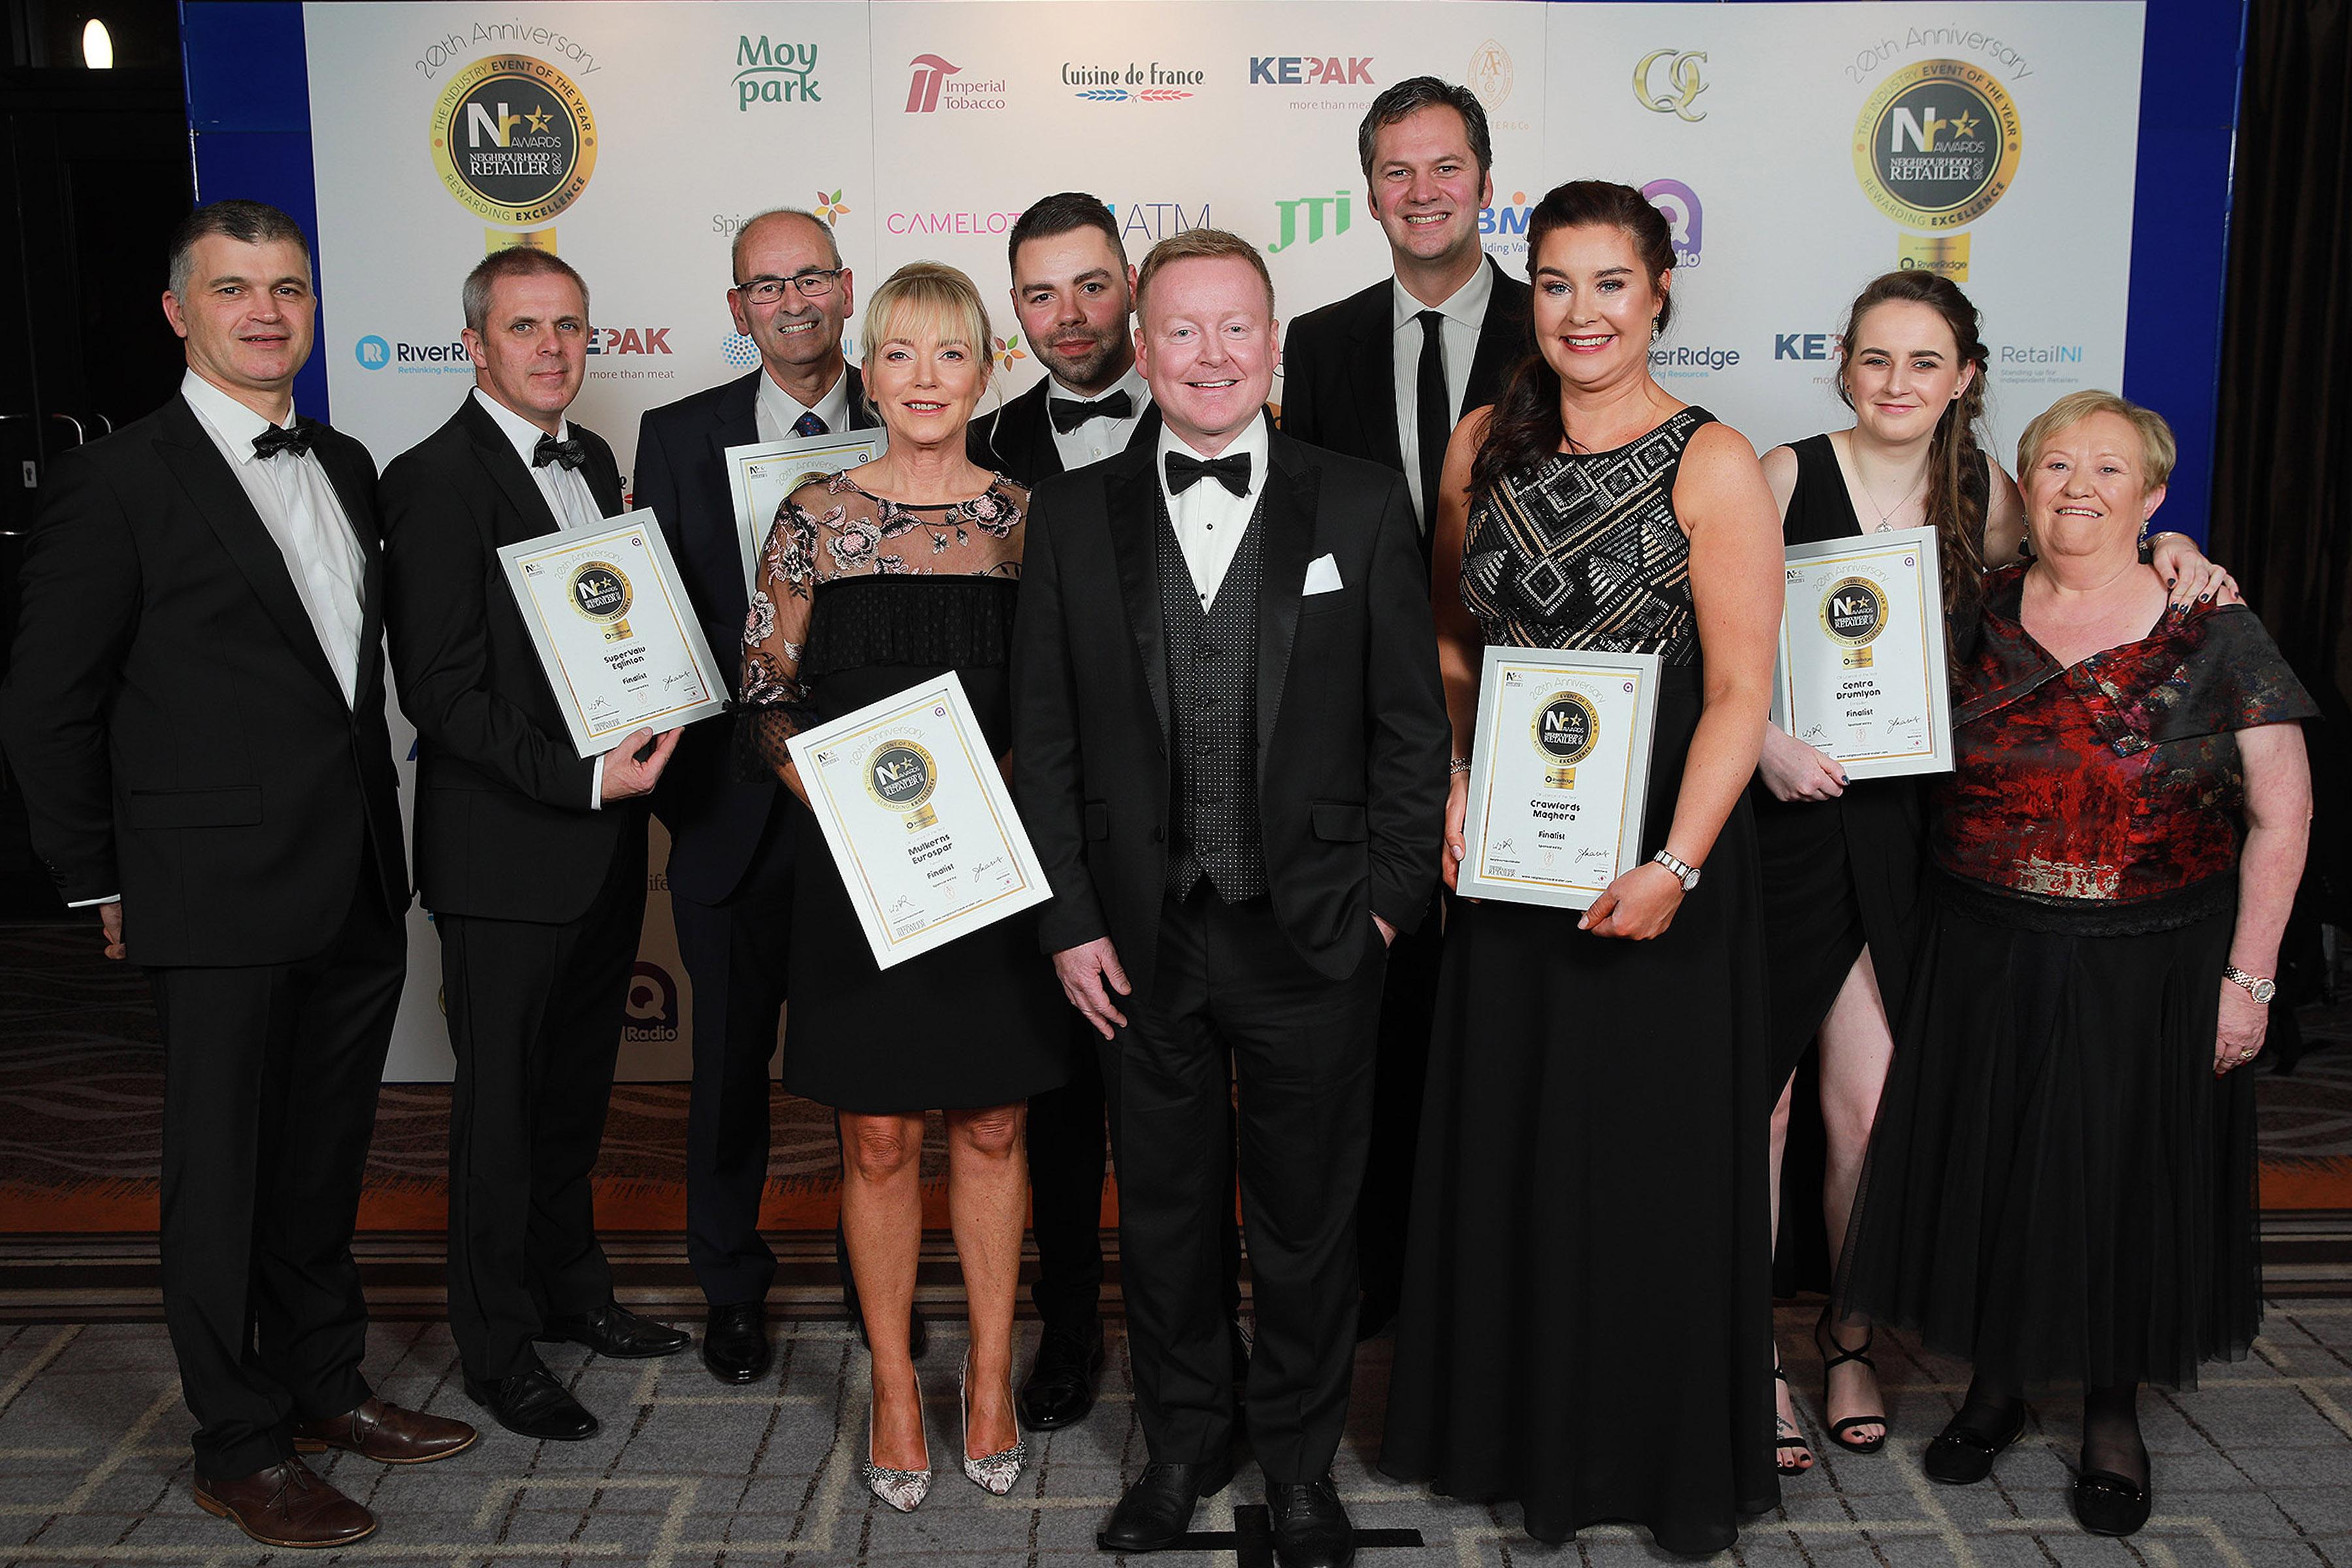 Neighbourhood Retailer Awards 2018 - Off Licence finalists